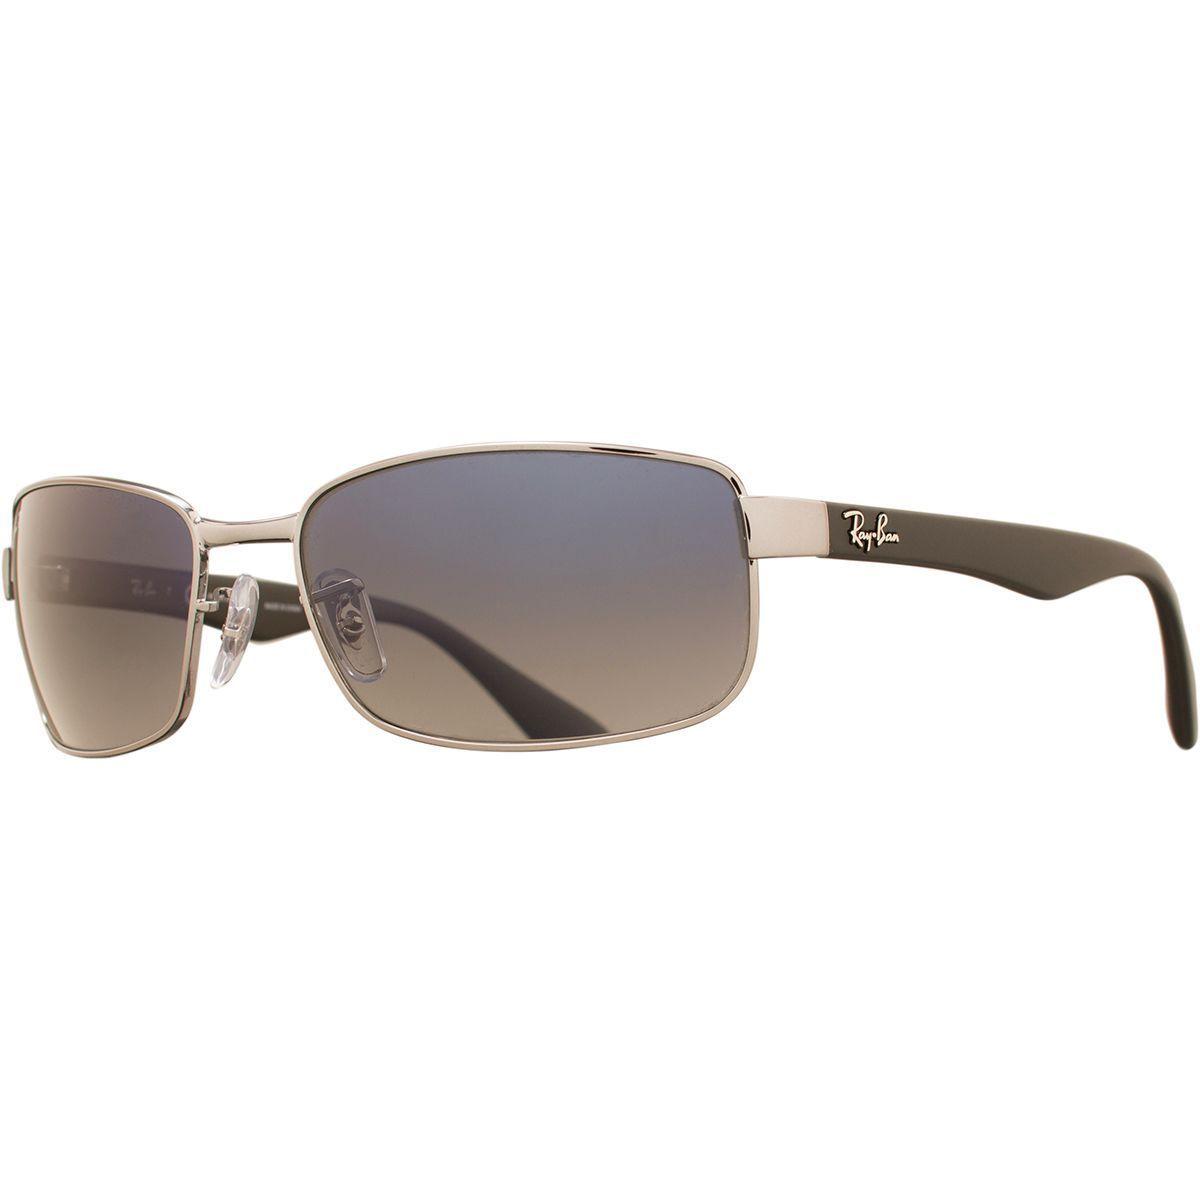 8ae718fe19 Ray-Ban Sunglasses  Aviator RB3588  65